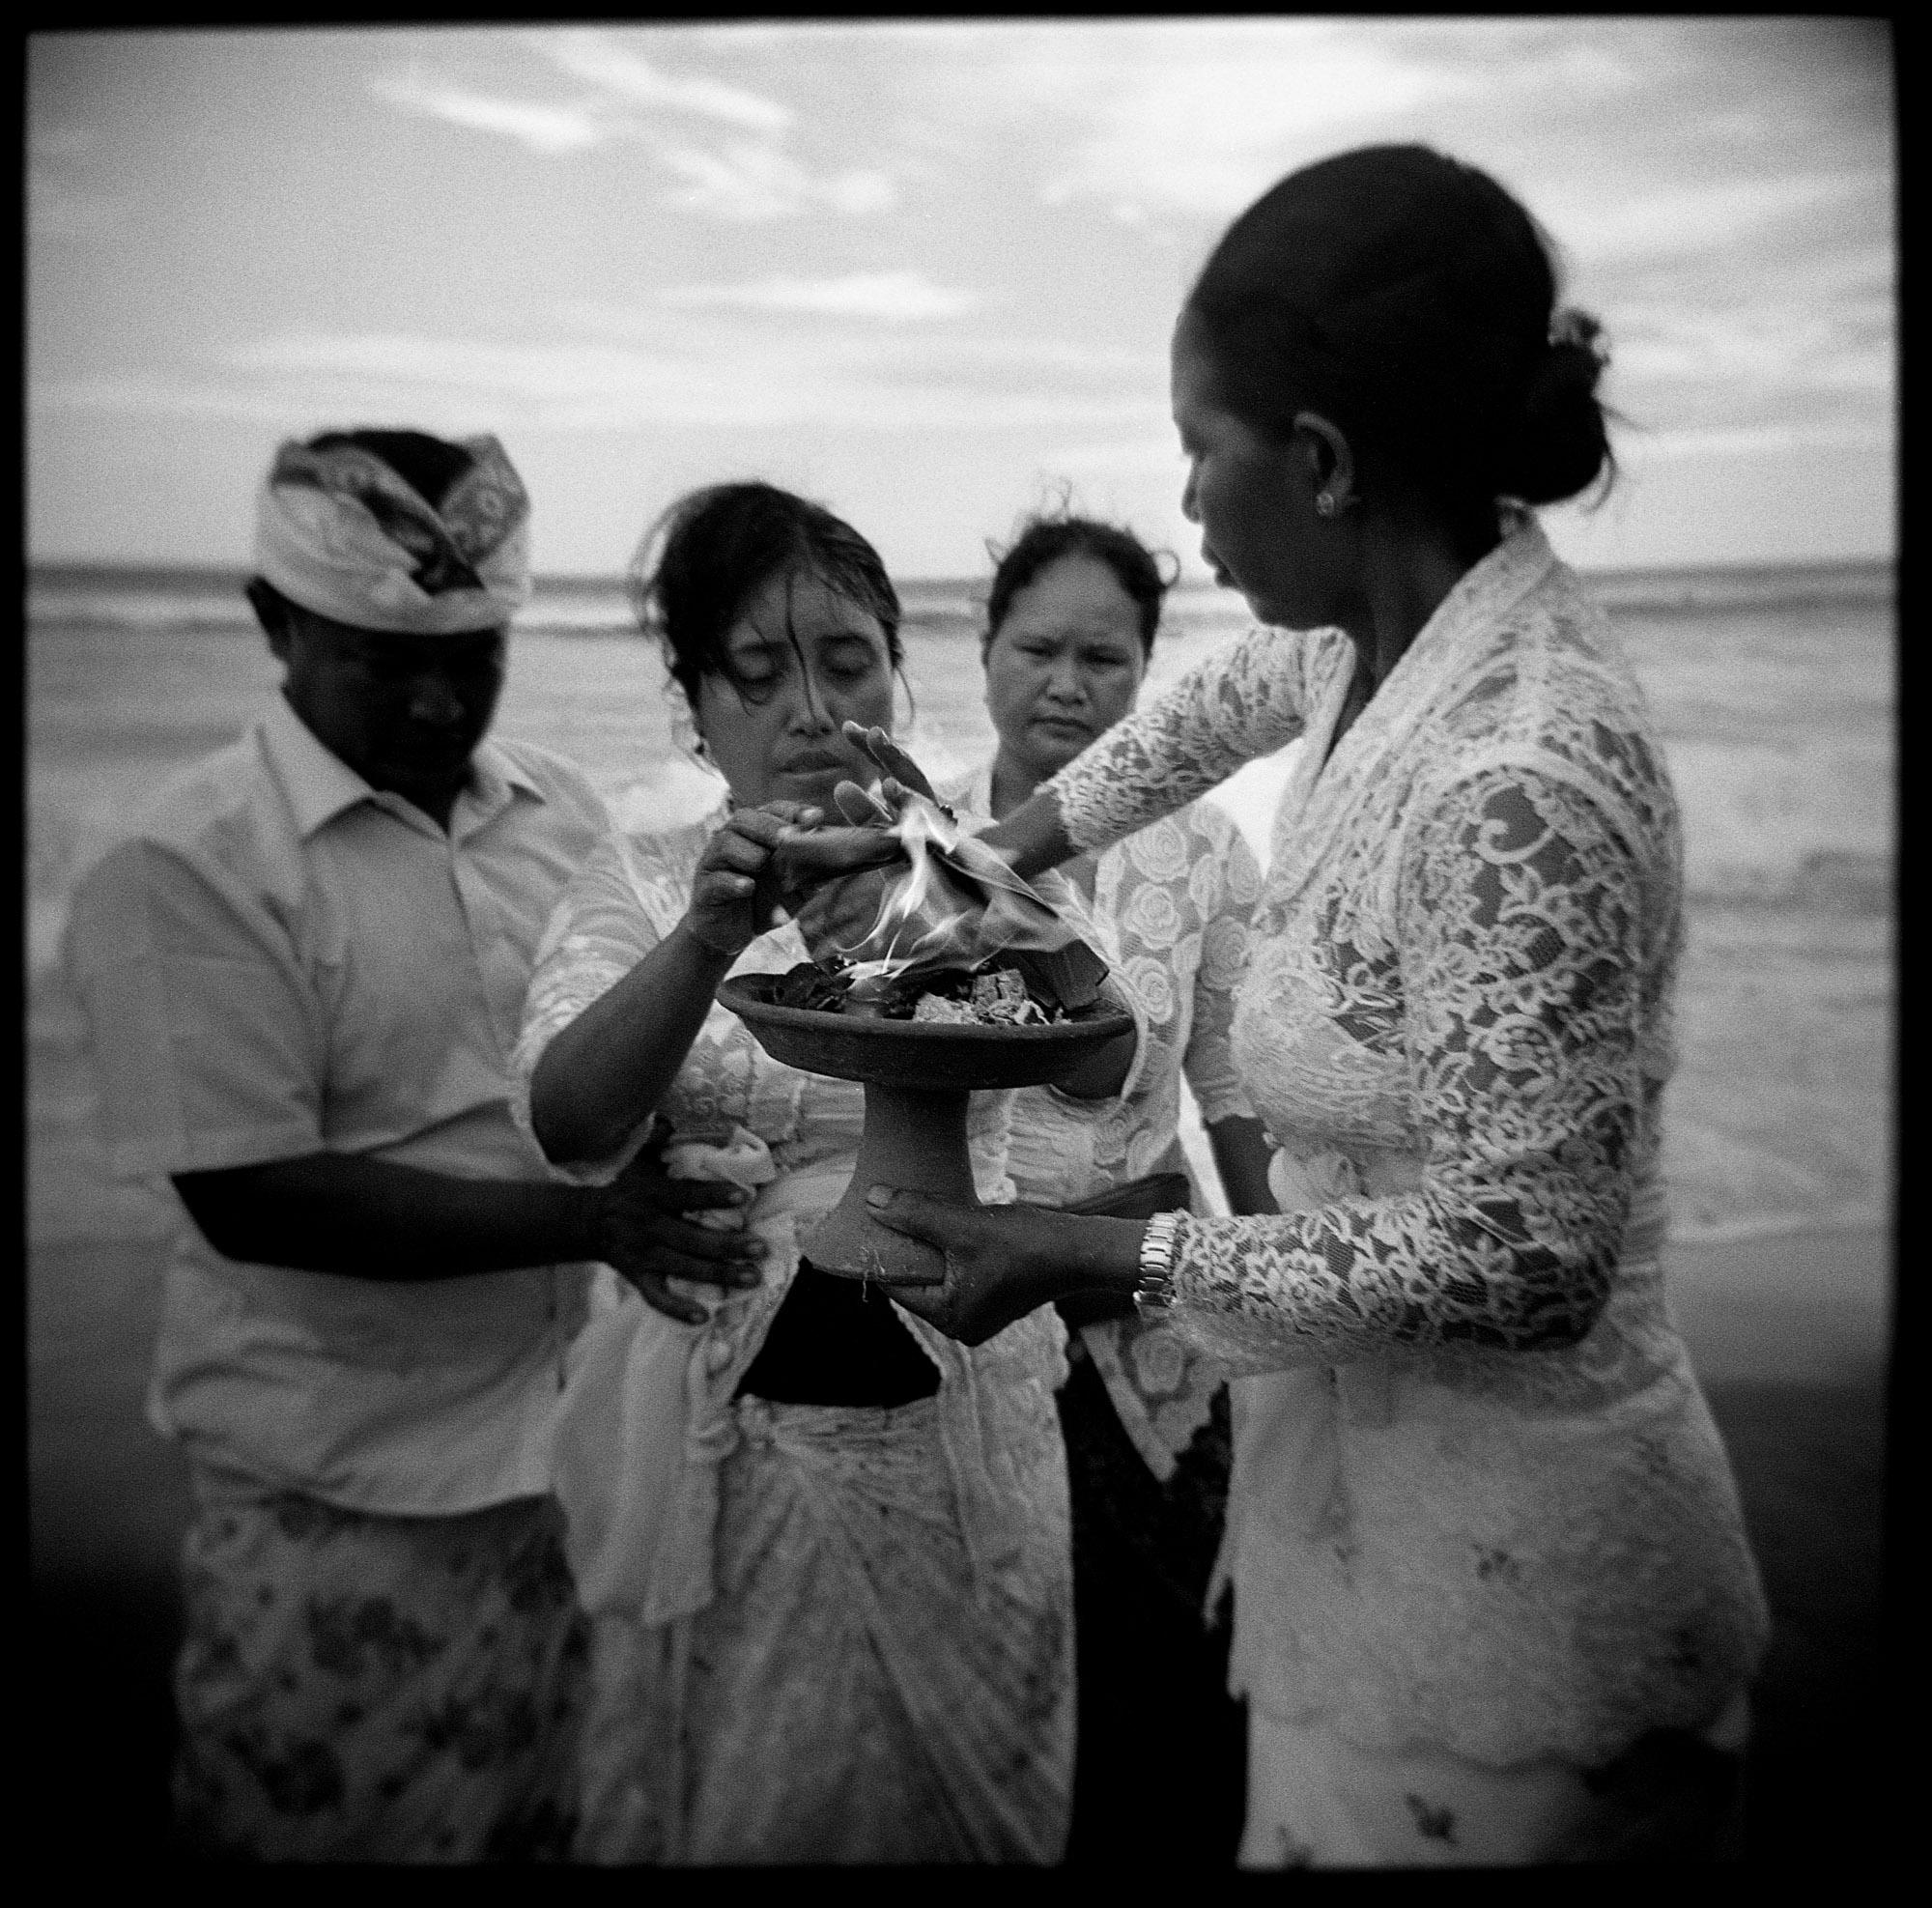 WebSP_methapisic spirituality_AgungParameswara_023.JPG